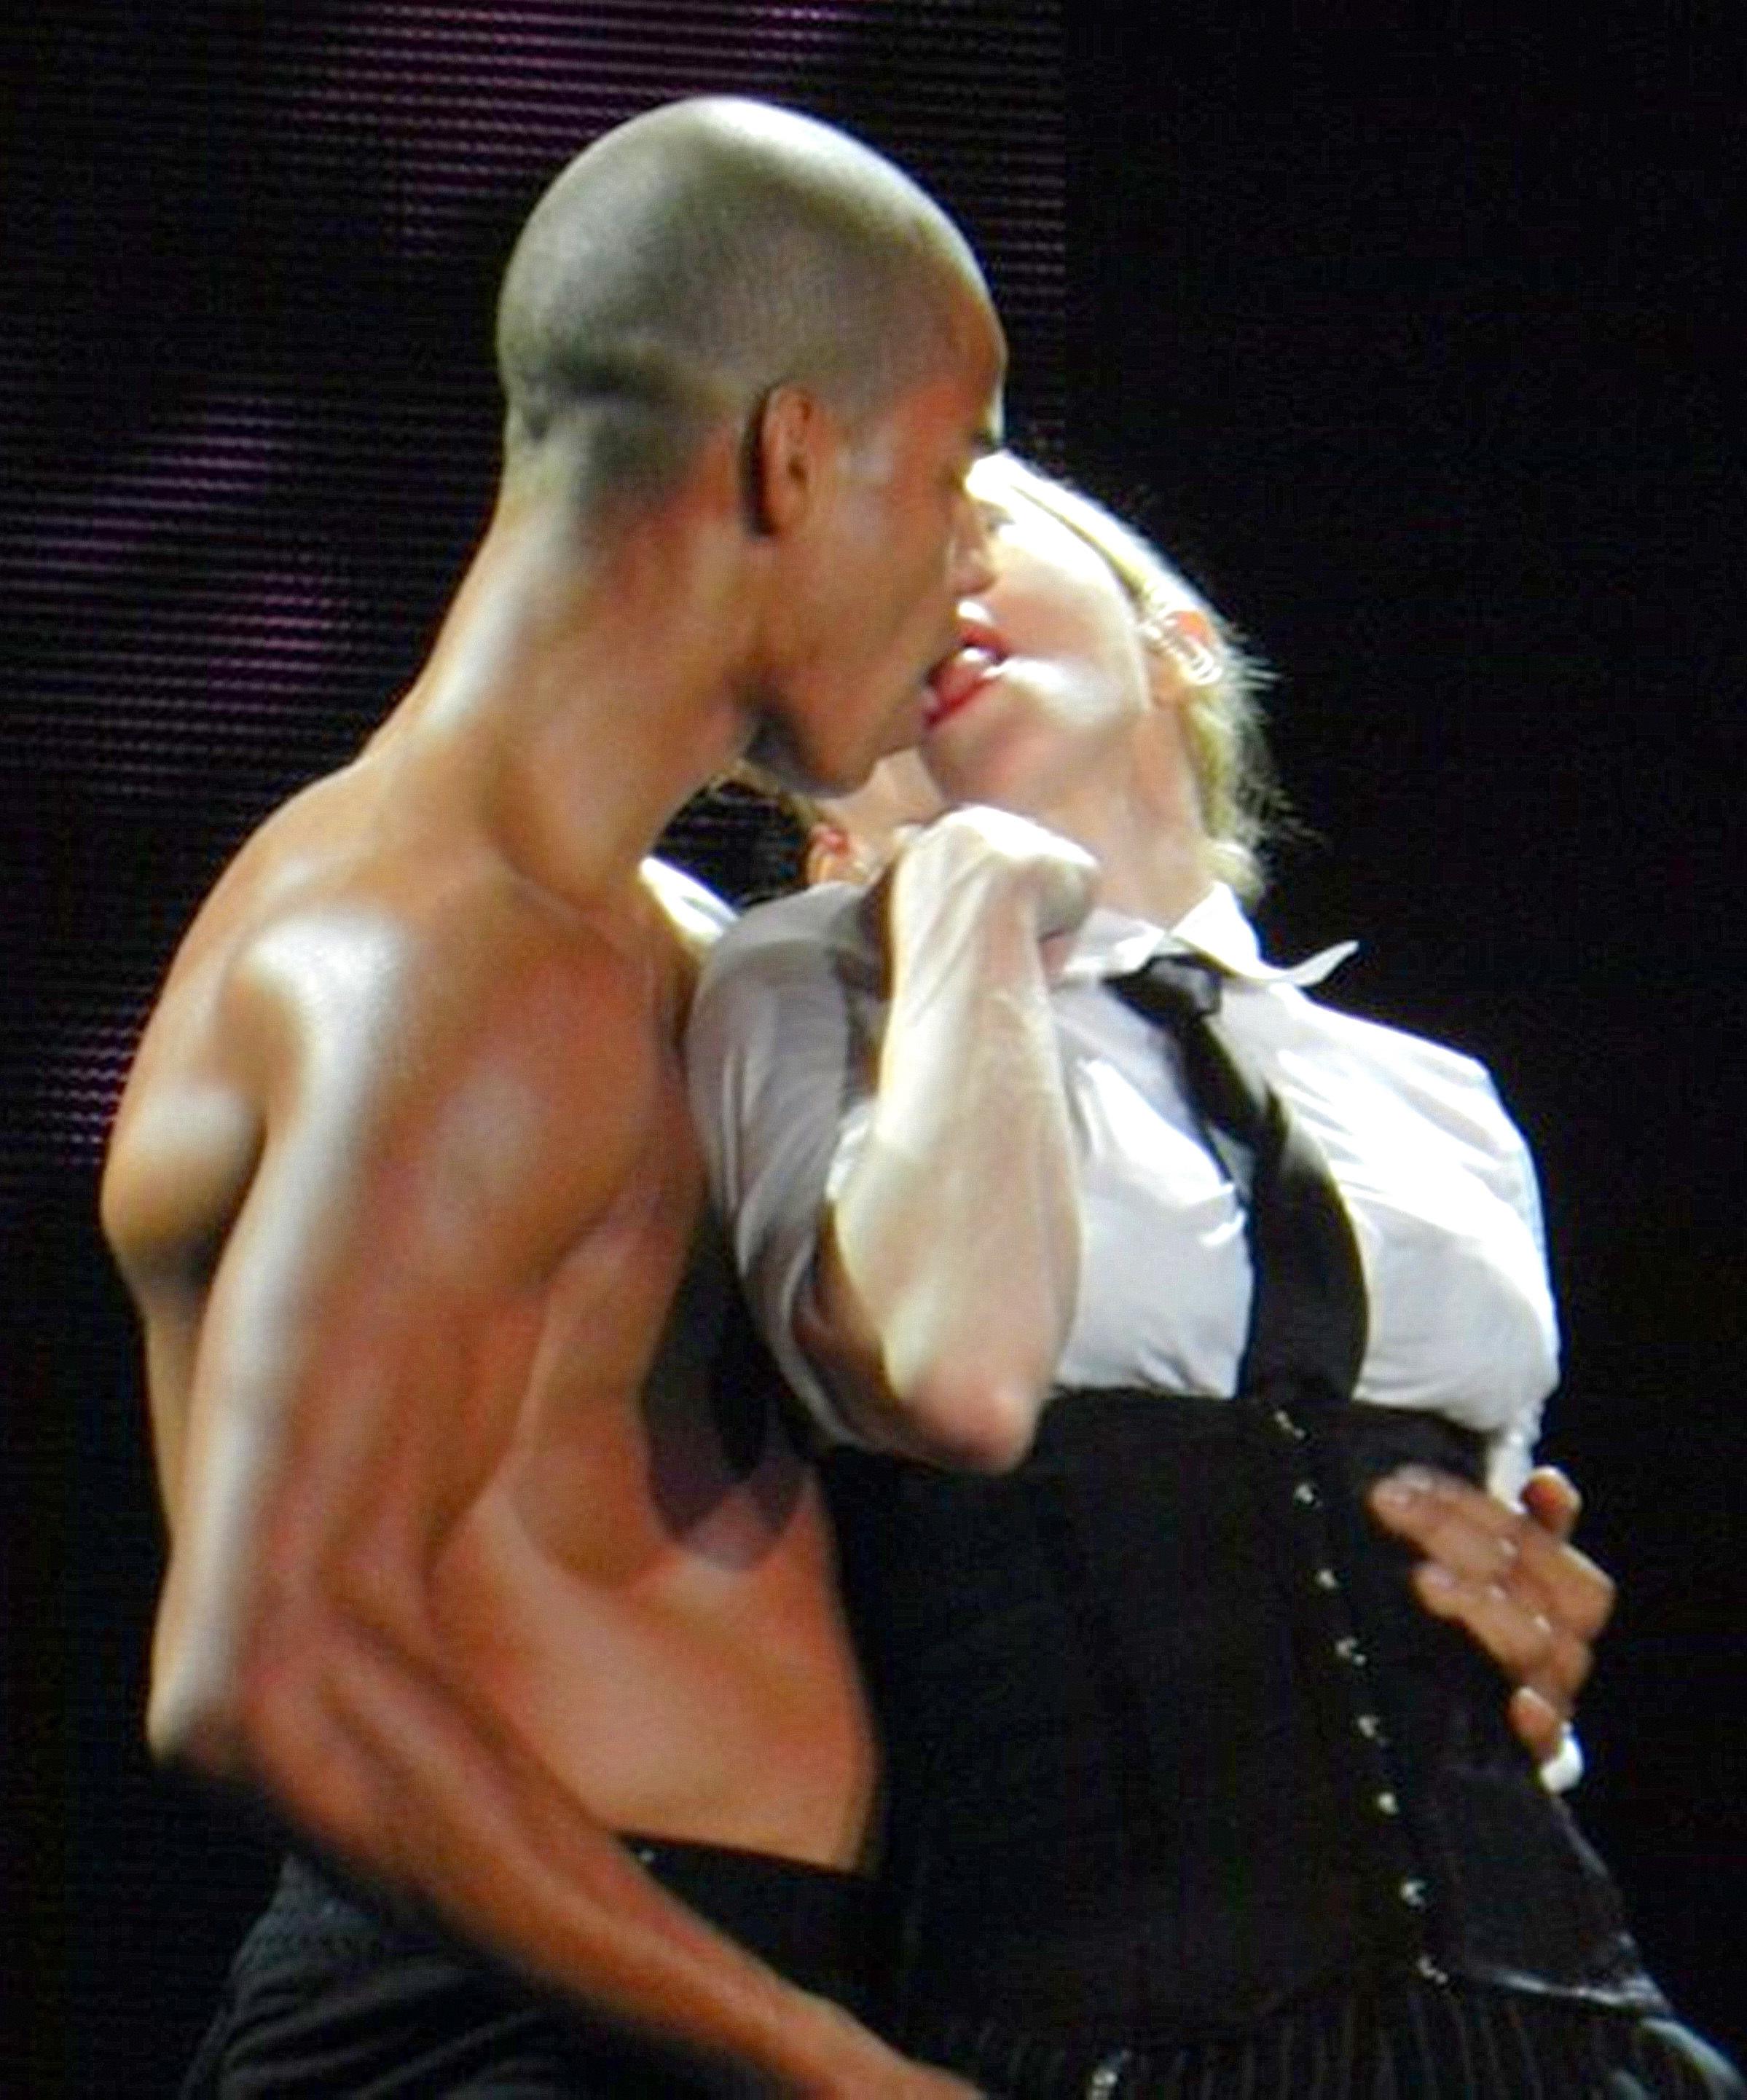 Madonna racy pics Instagram warning kiss explicit